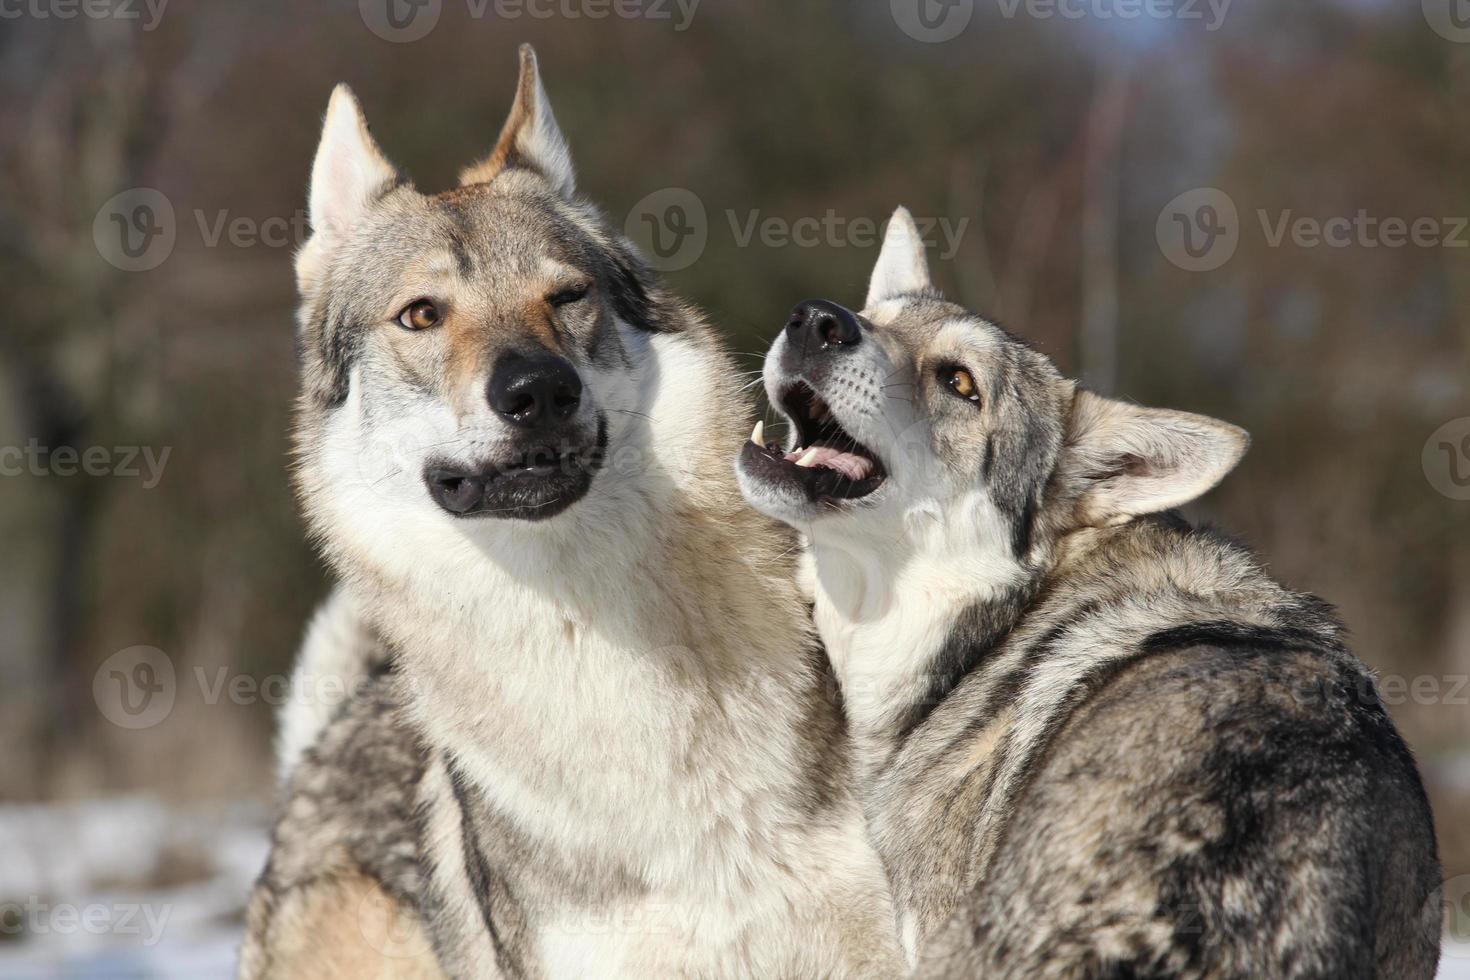 wolfdog checoslovaco que corteja uma cadela saarloos foto